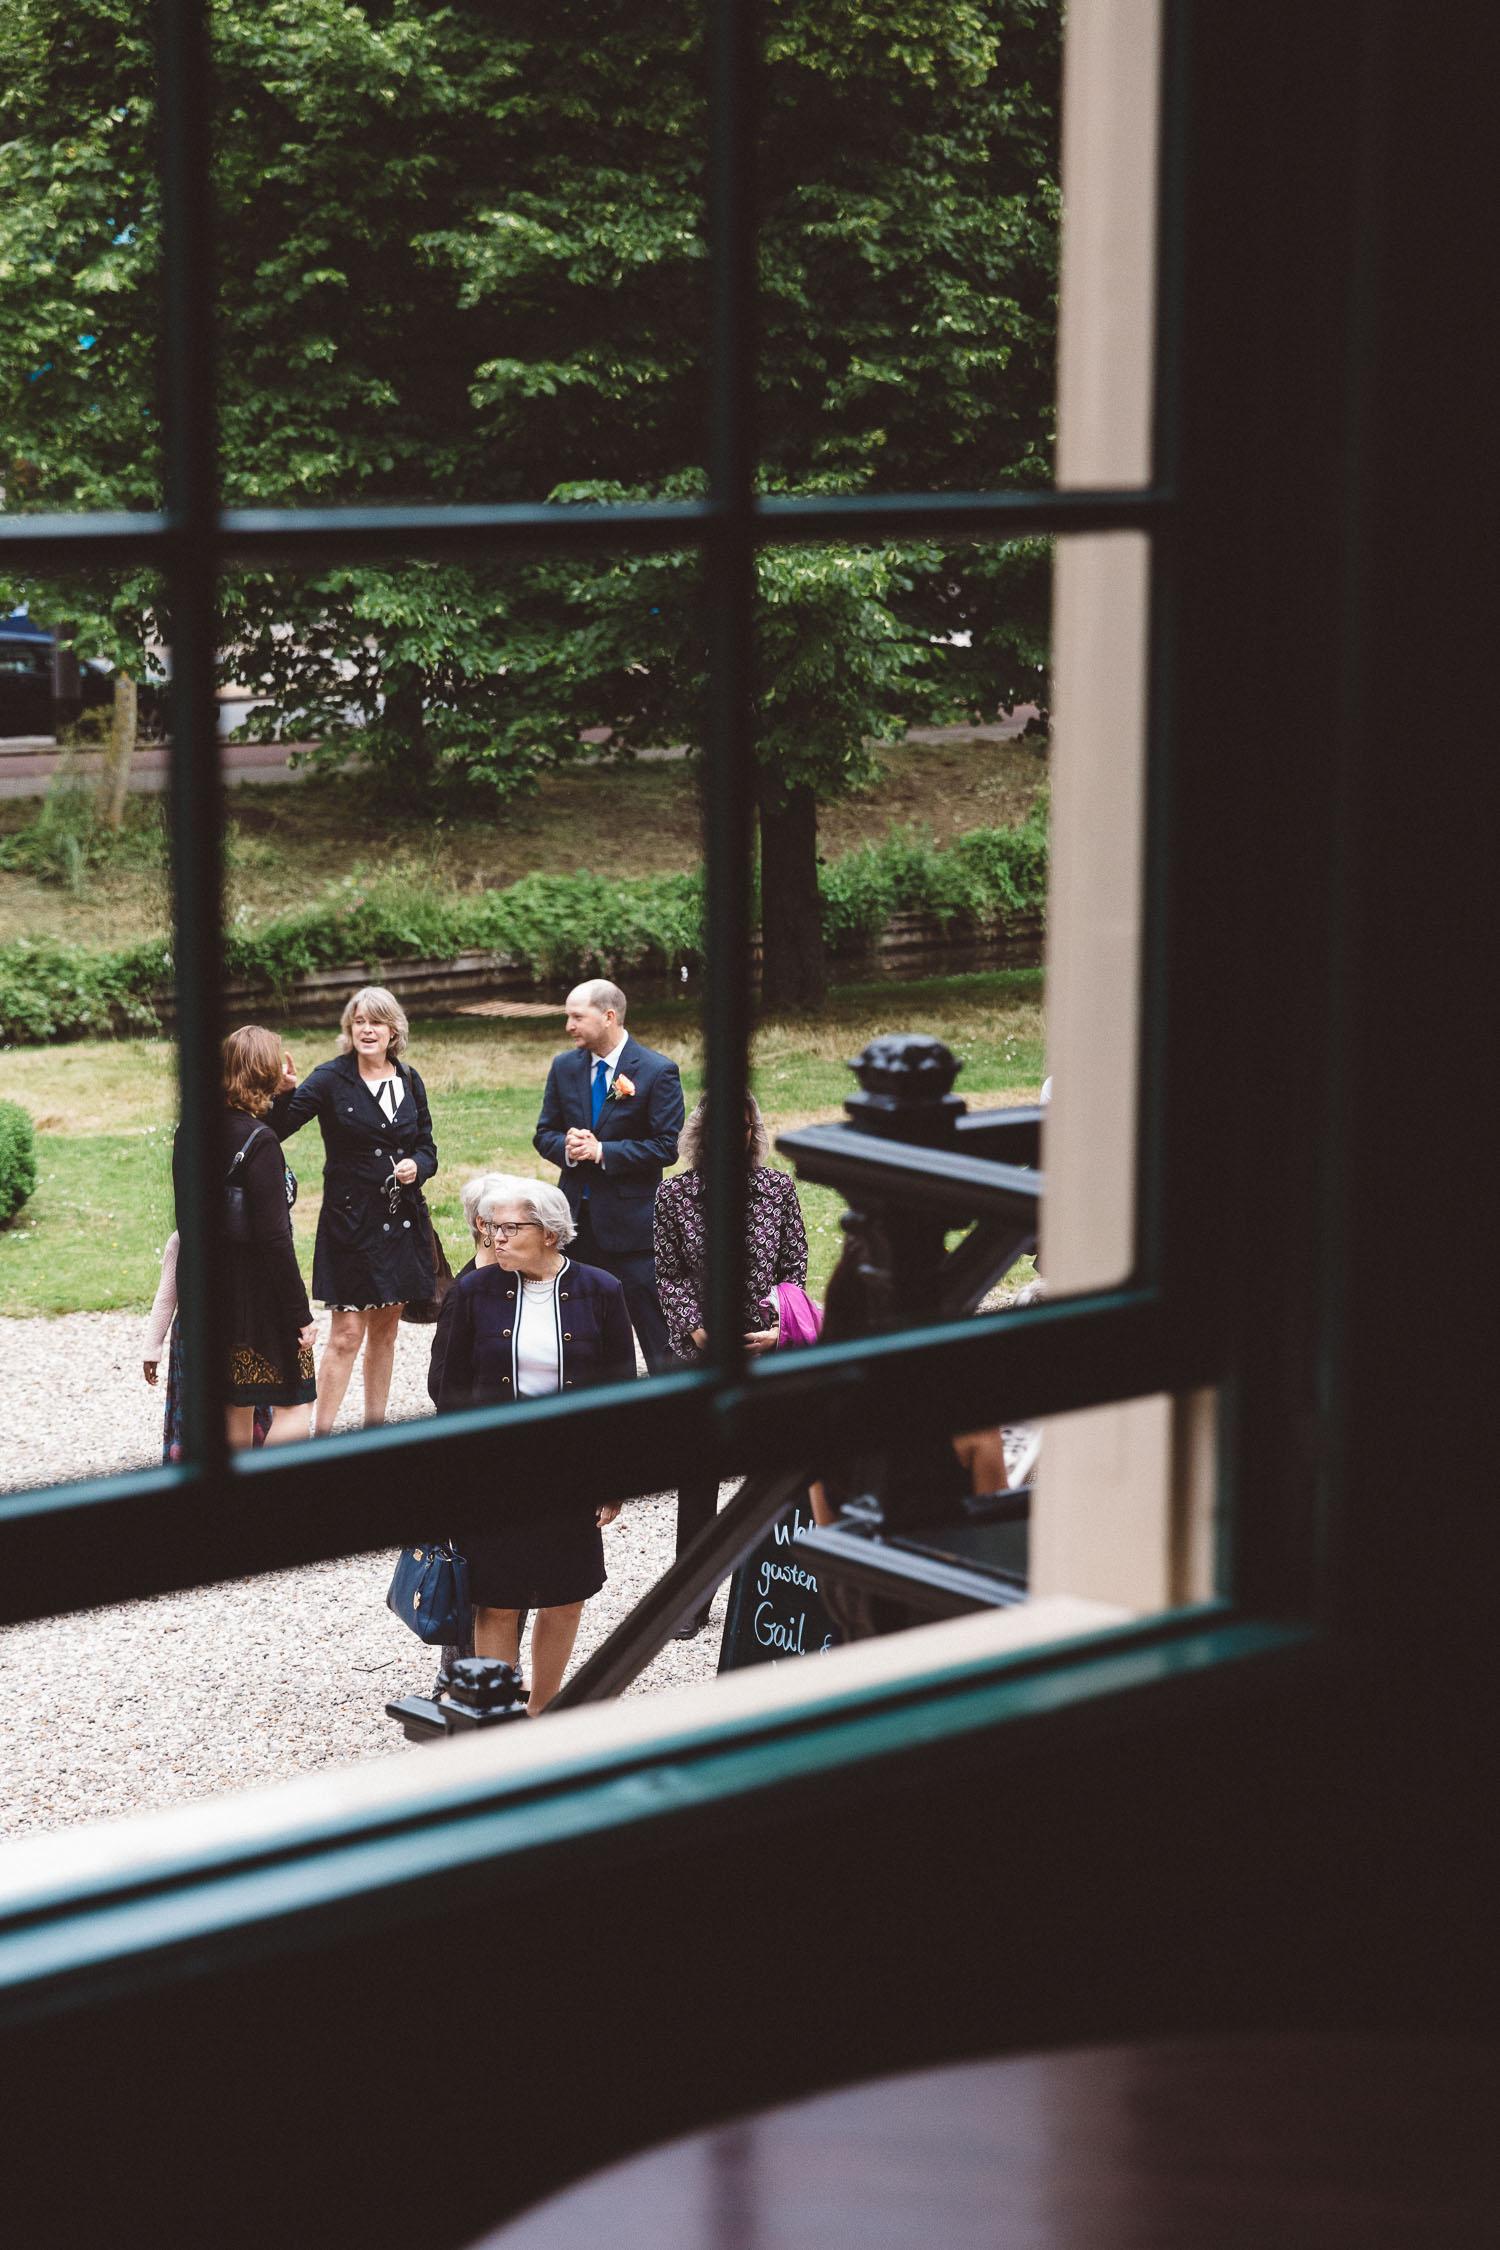 Wedding-huwelijk-trouwen-bruiloft-photography-fotografie-fotograaf-photographer-Huize-Frankendael-On-a-hazy-morning-Amsterdam-The-Netherlands-22.jpg